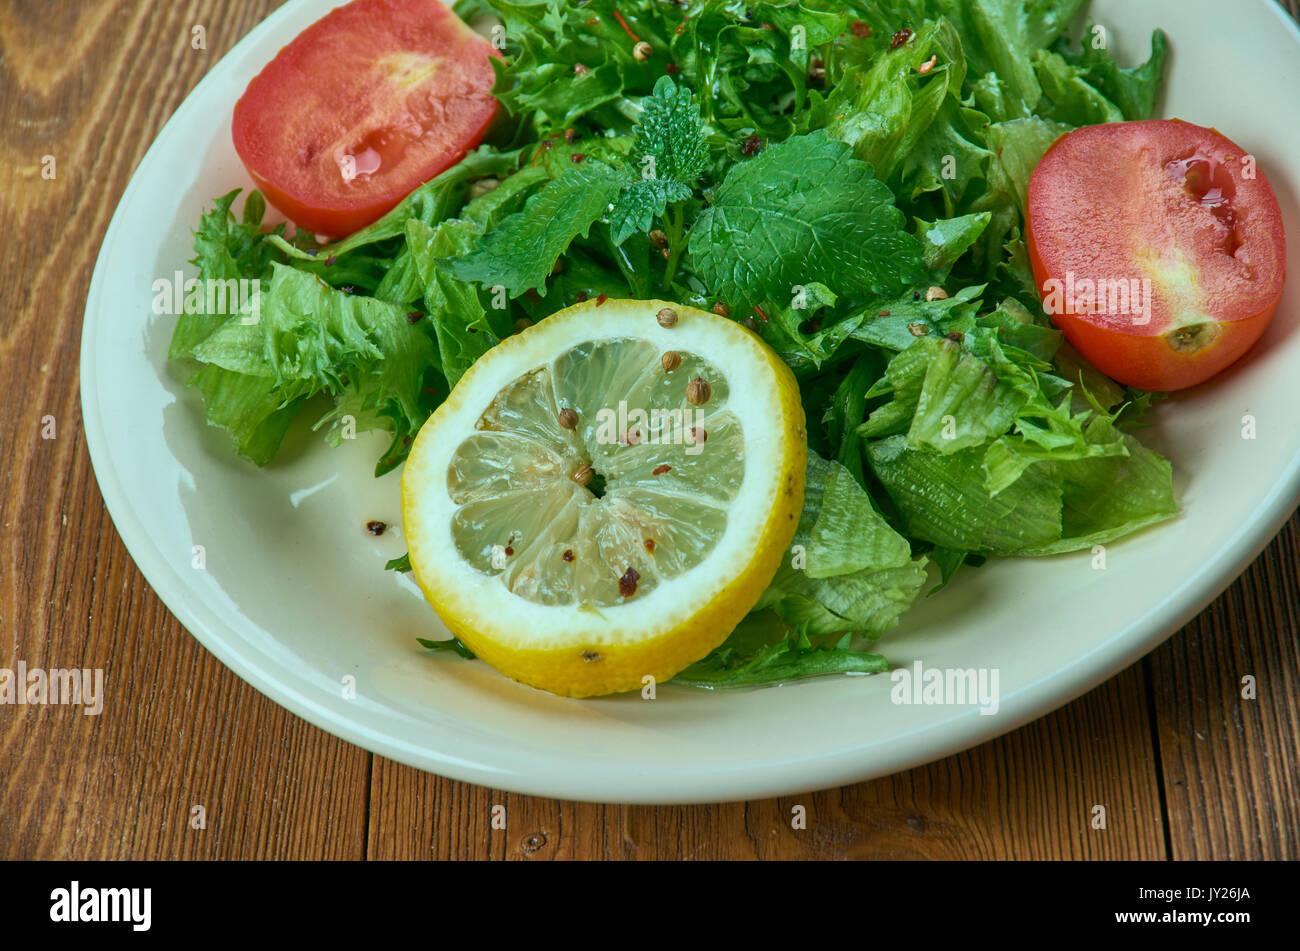 Turp otu salad - Spring salad from leaves of wild radish with garlic. Turkish cuisine - Stock Image